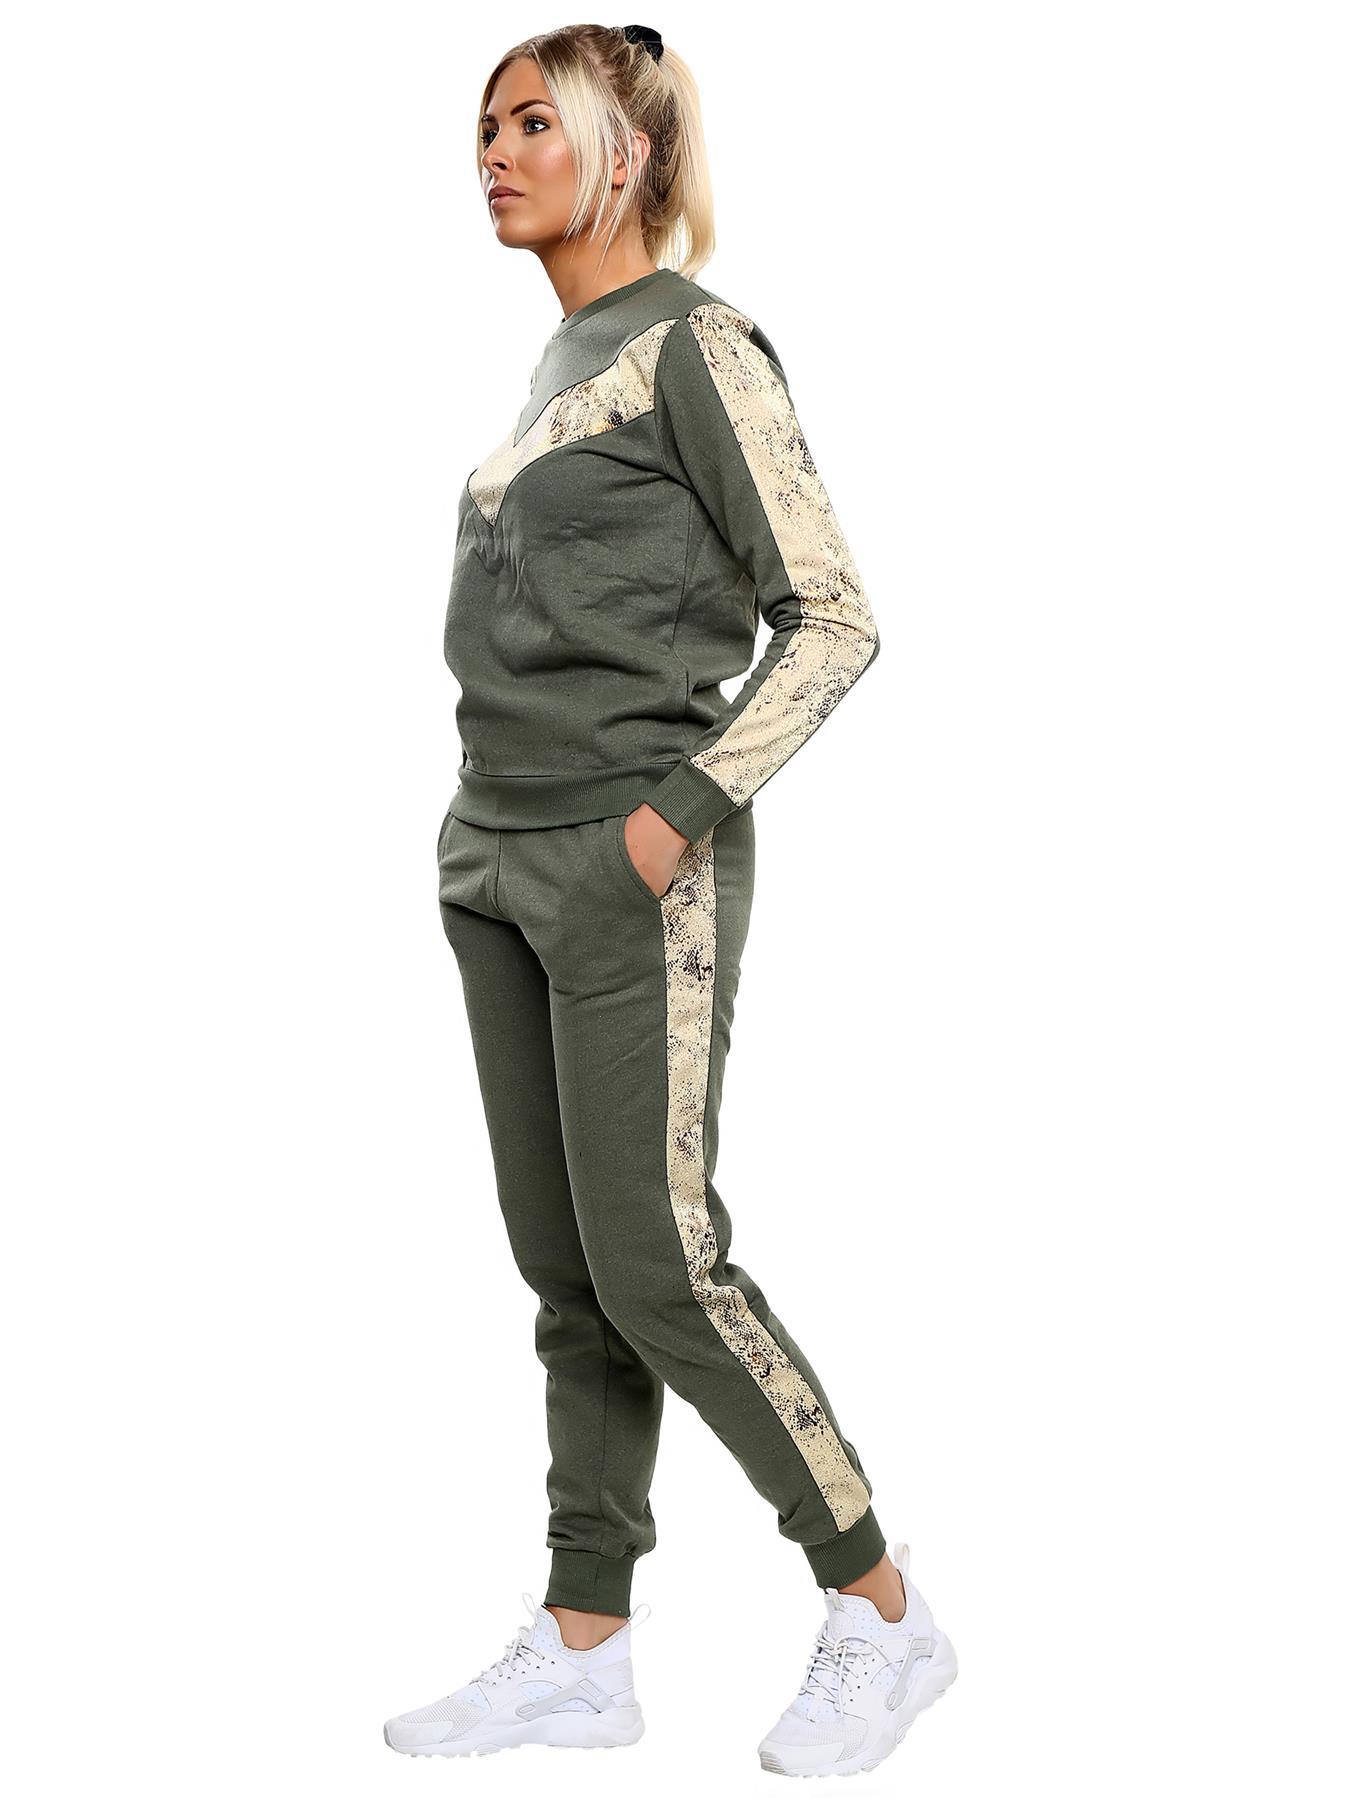 Womens 2 PCS Tracksuits Set Tops Pants Ladies Joggers Active Sport Loungewear UK